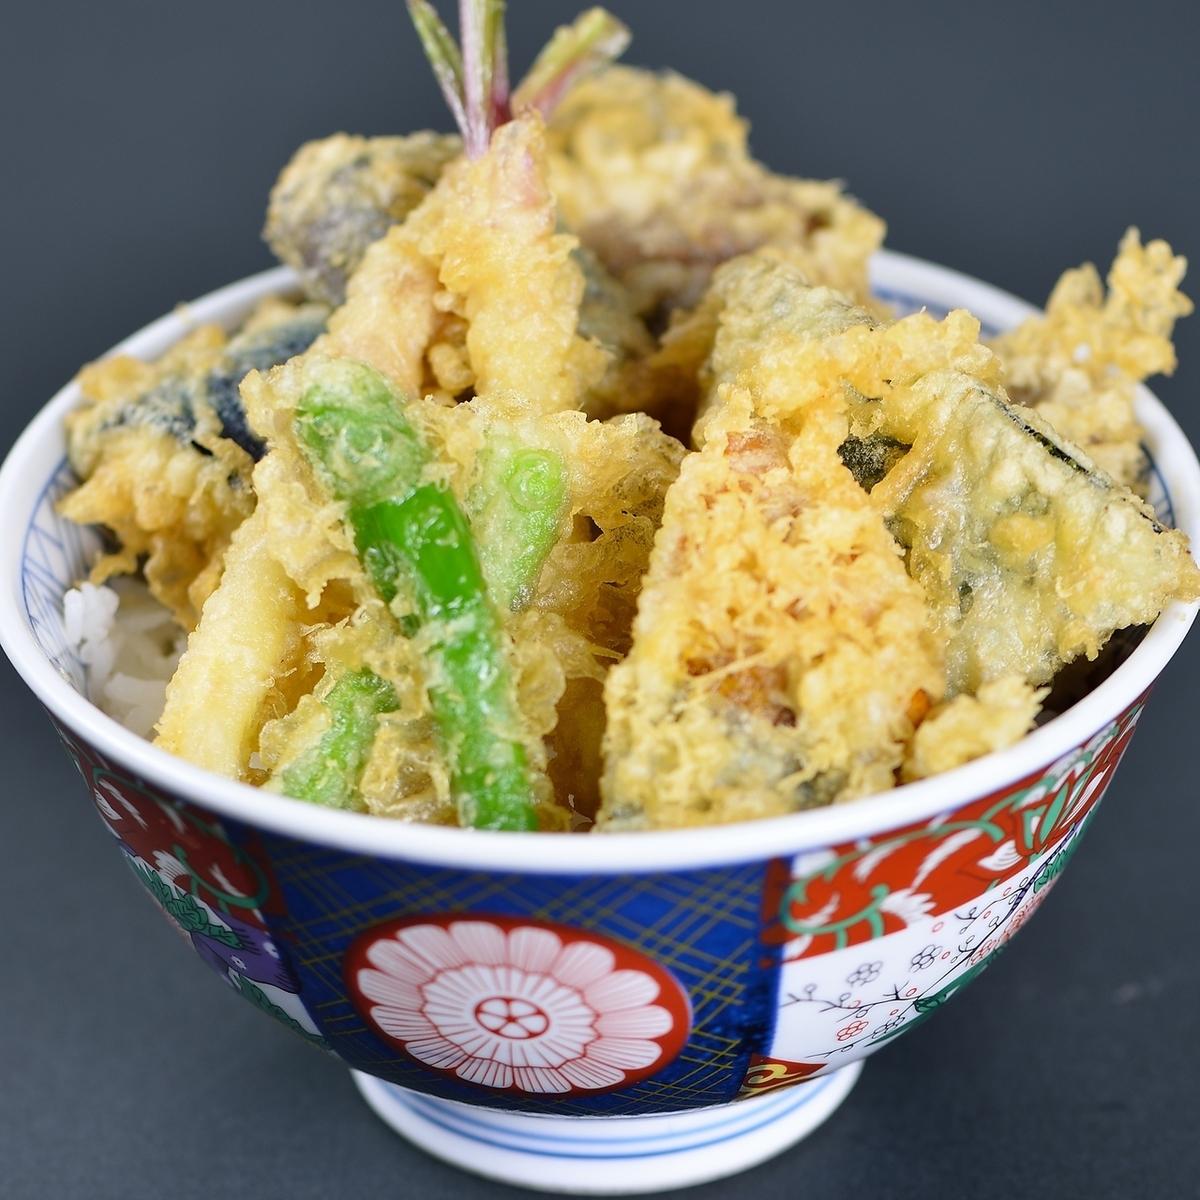 Vegetable on rice